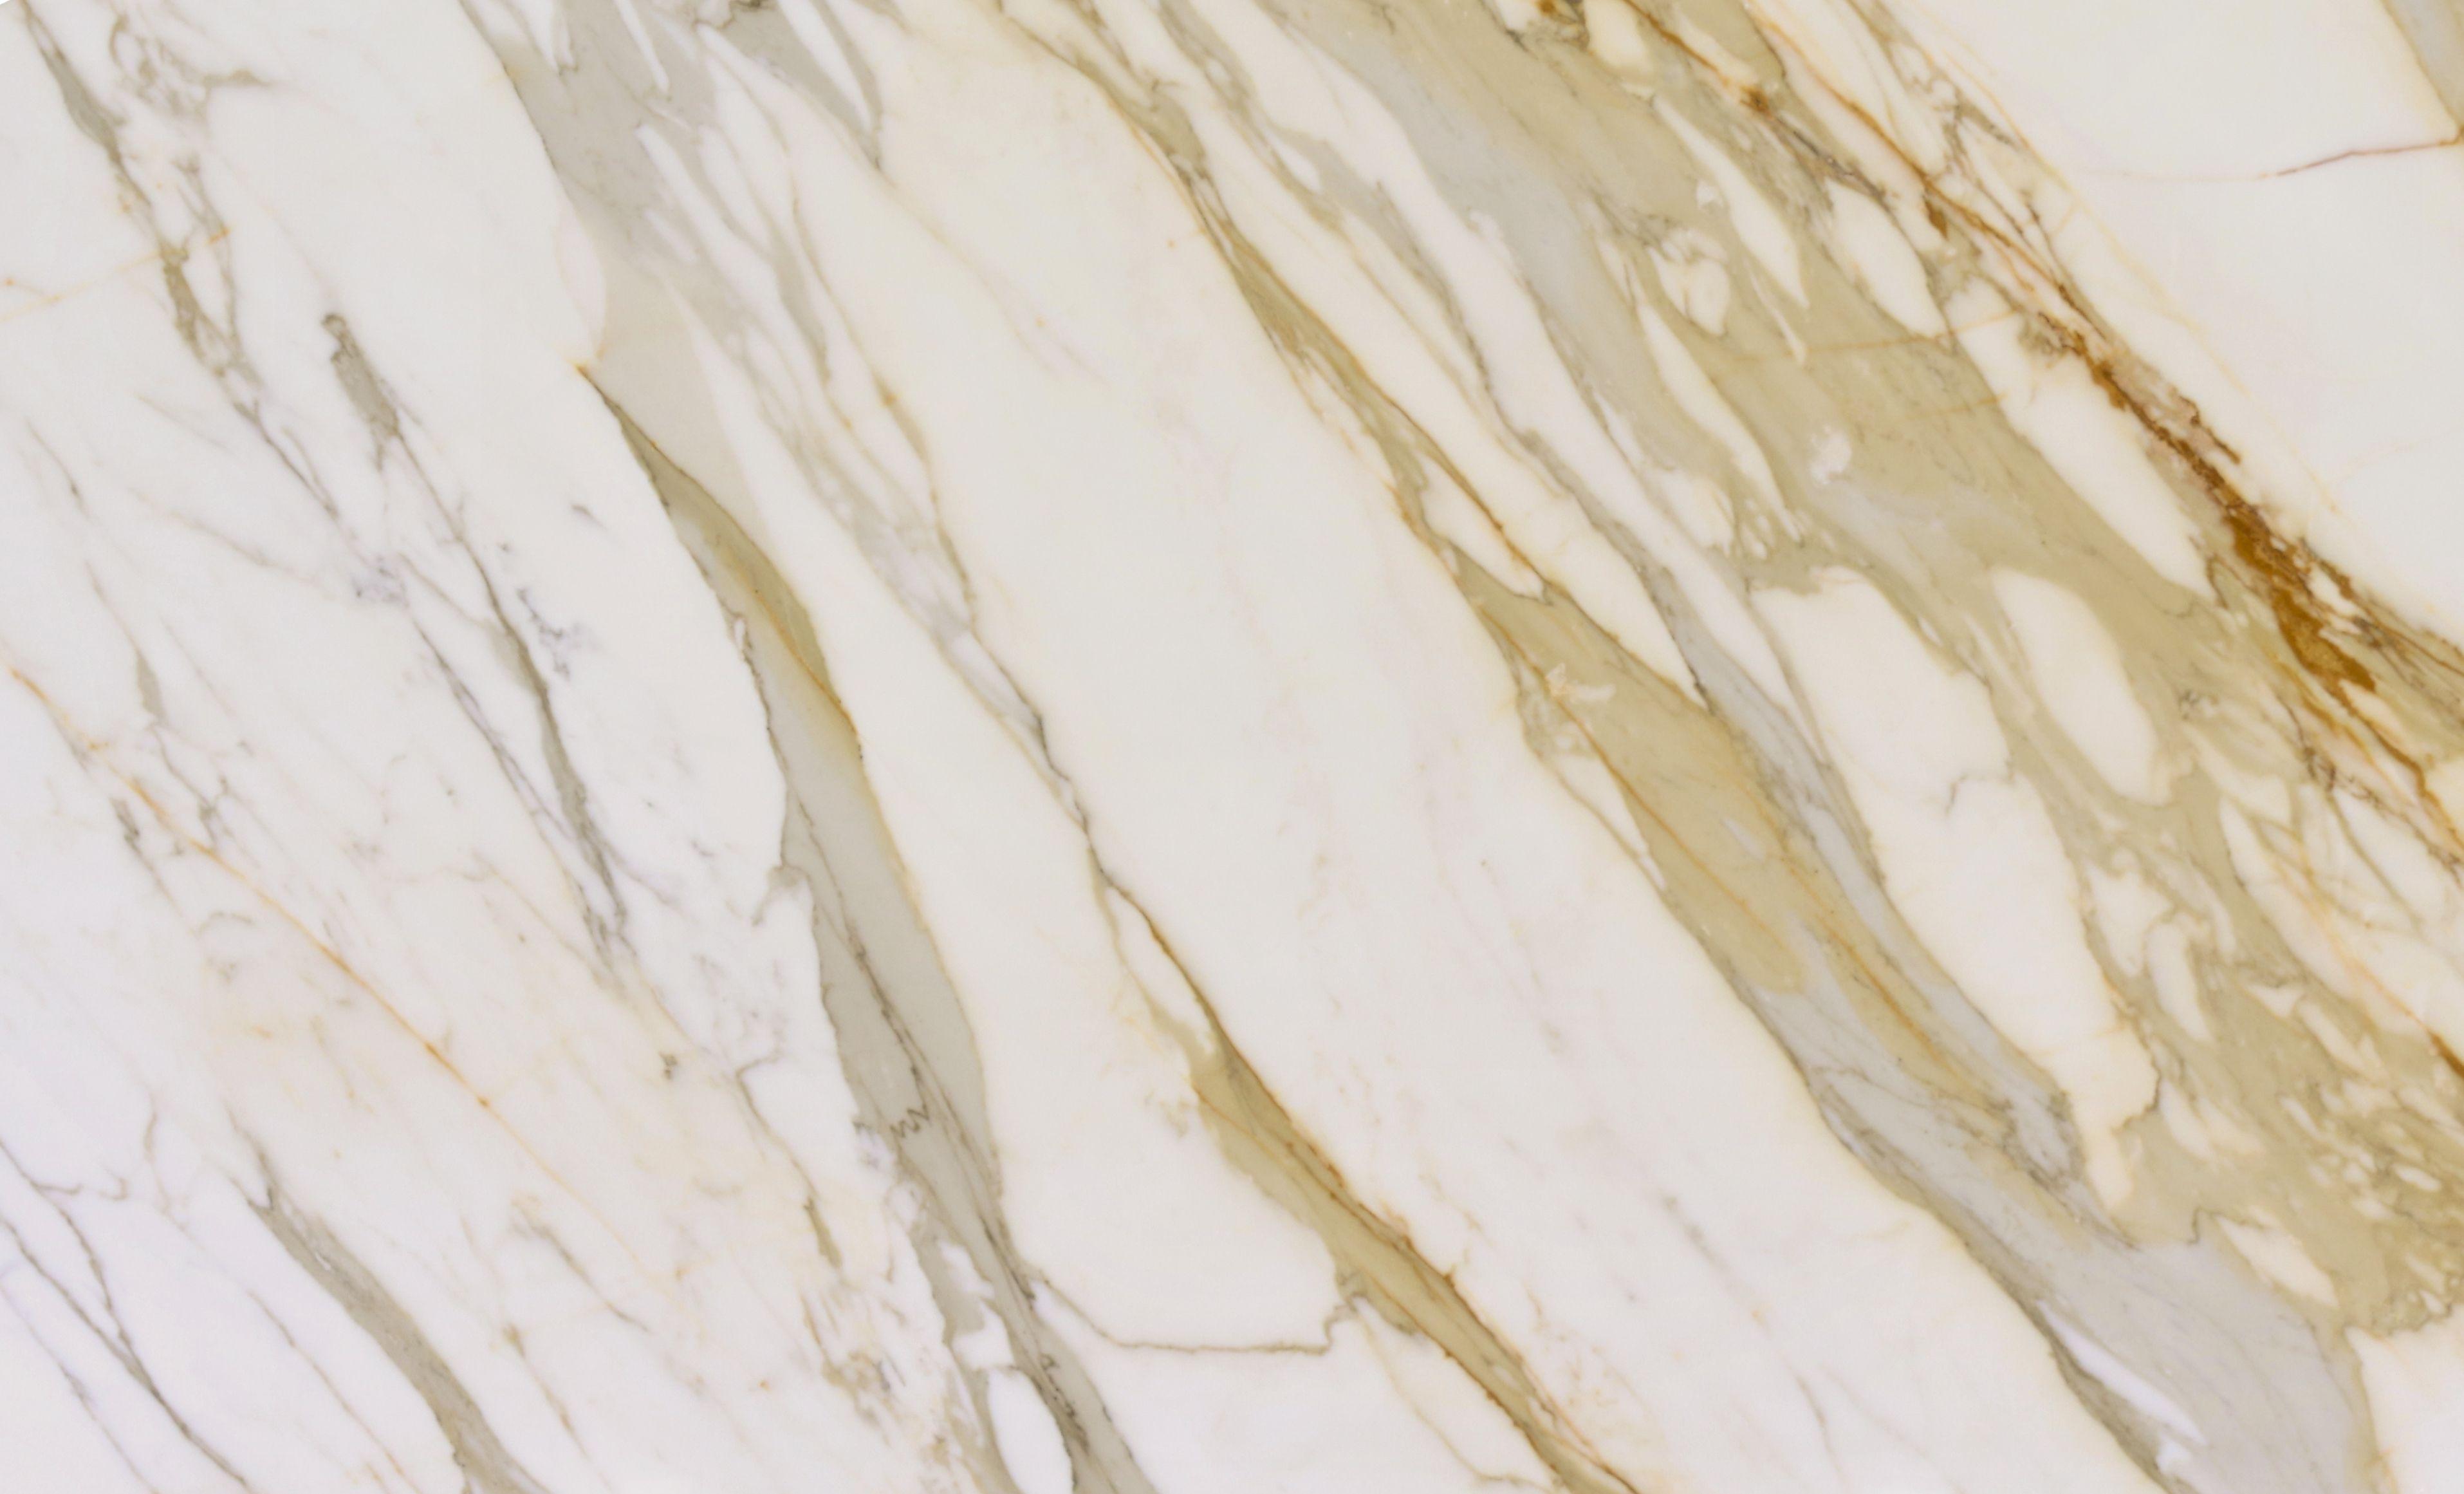 Calacatta Gold Borghini Paonazzo Marble Calacatta Gold